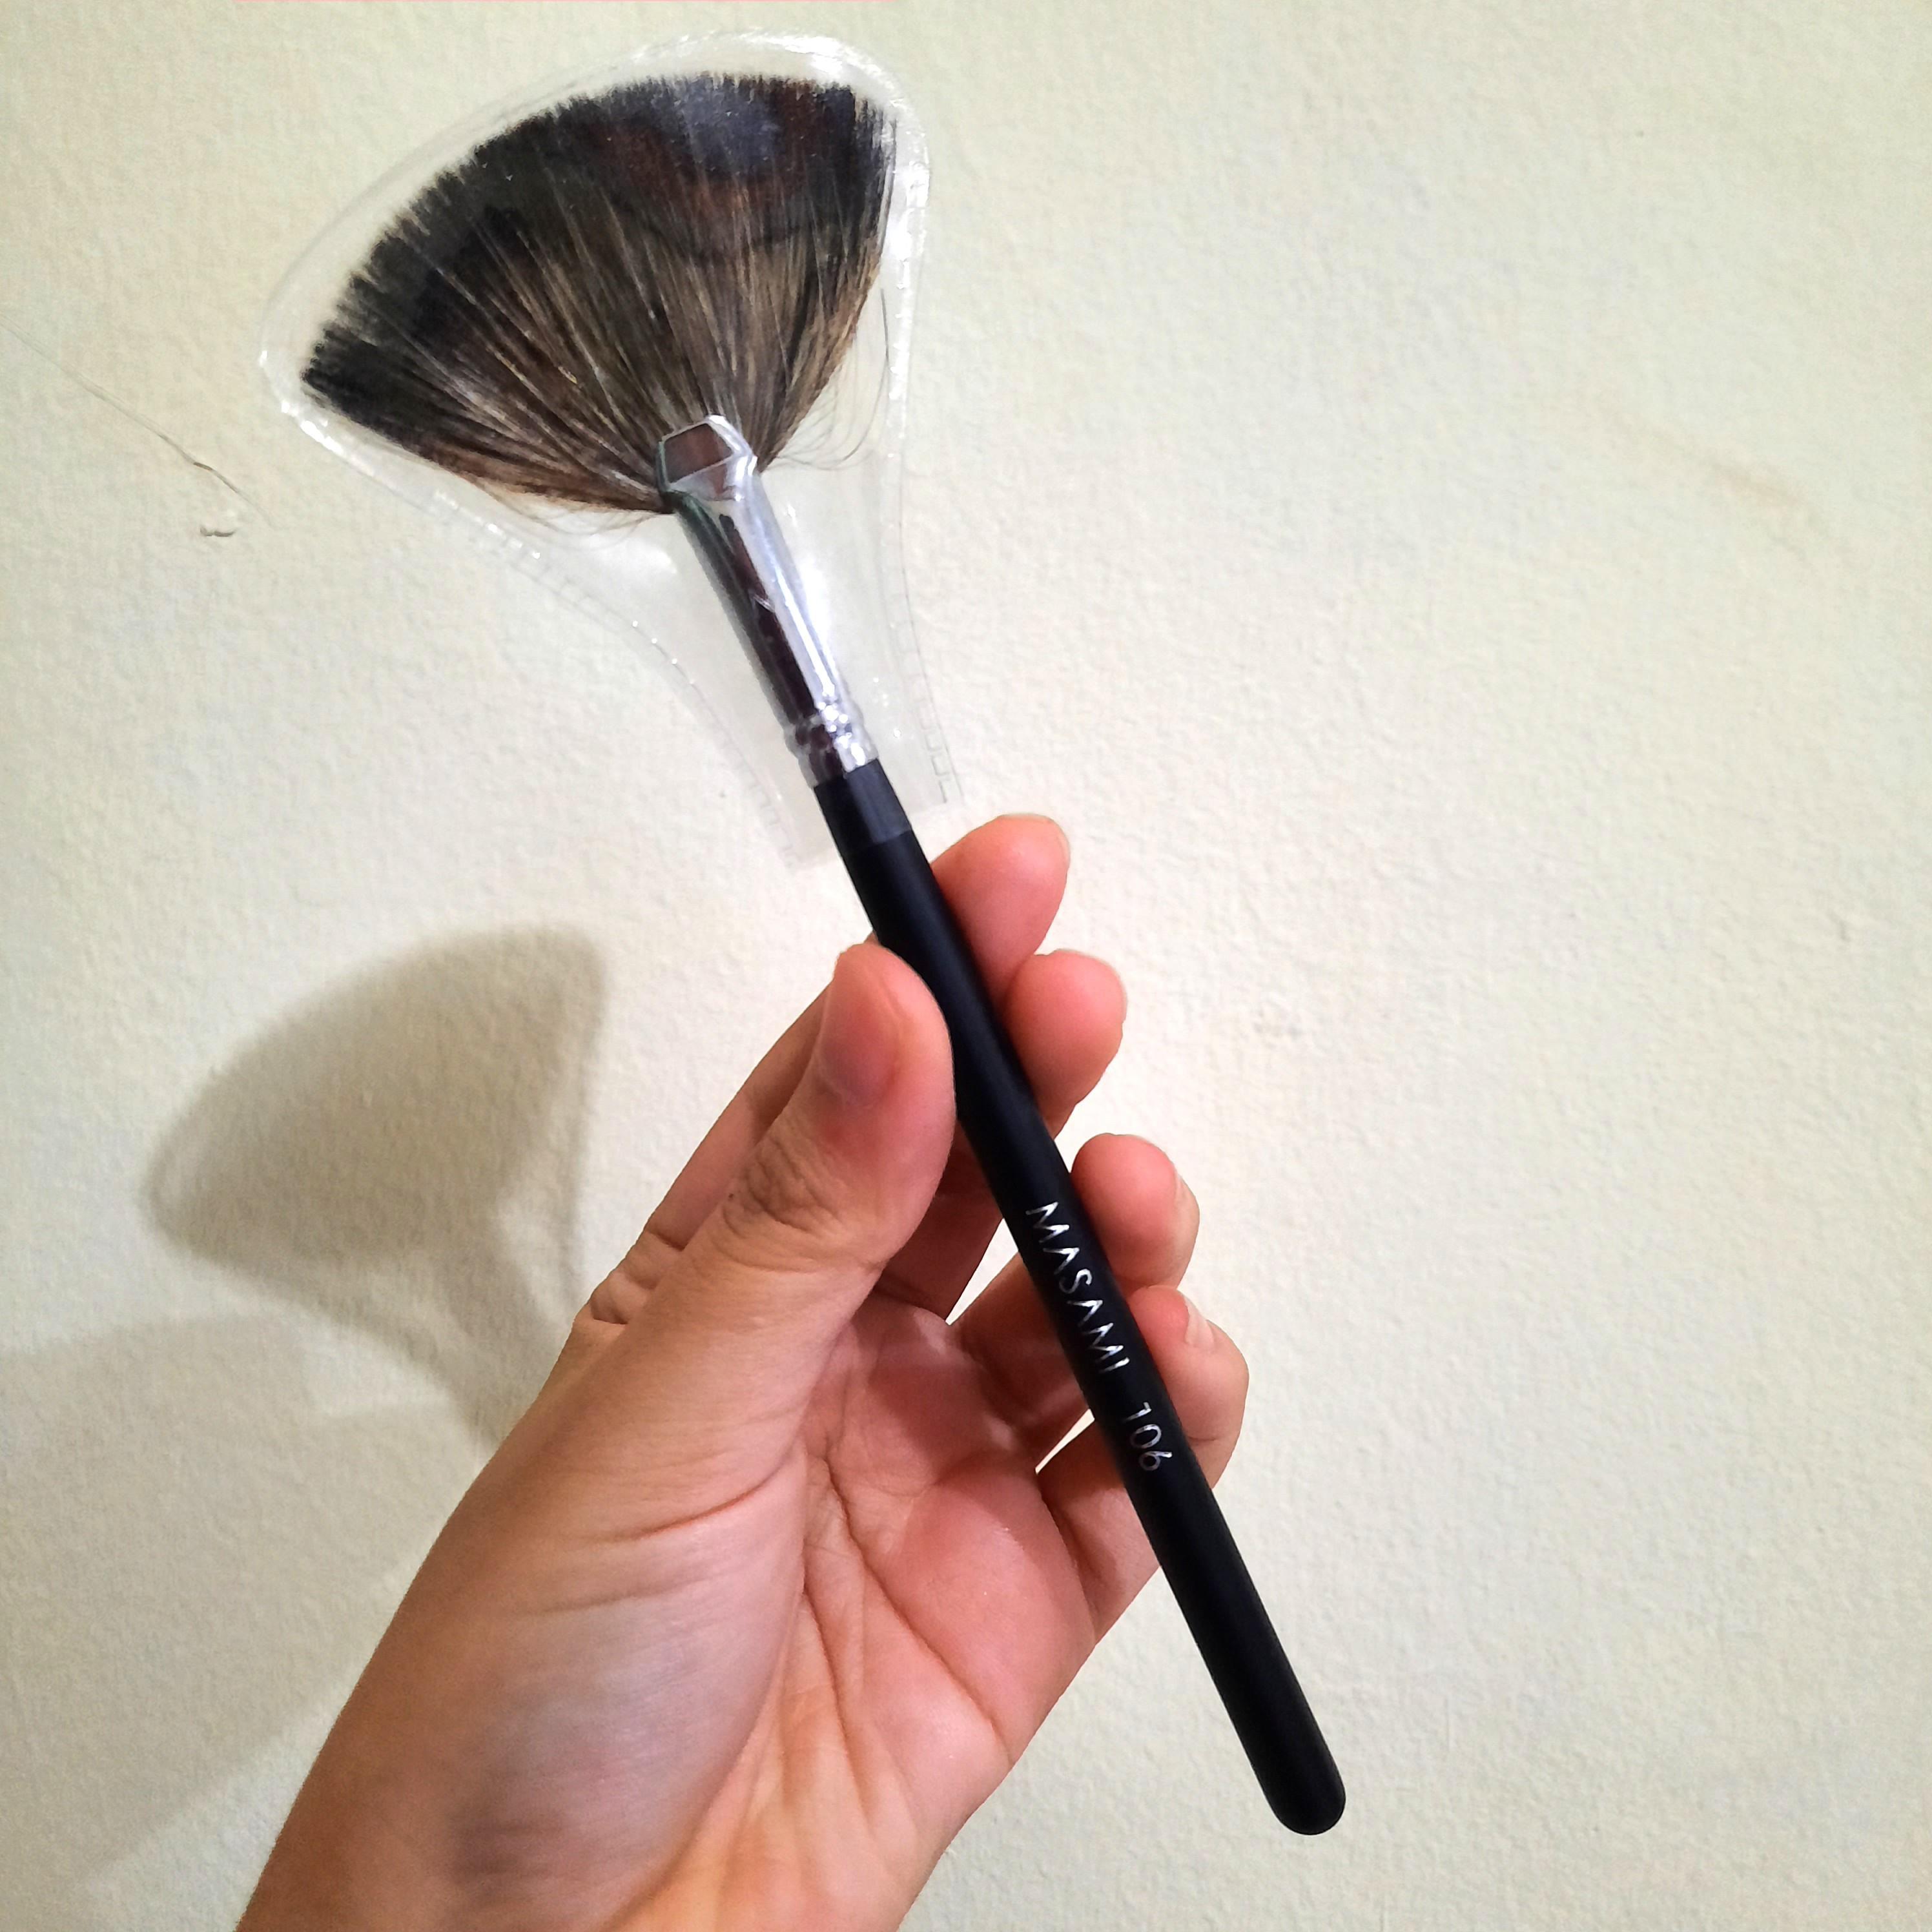 Highlighter Brush Masami Shouko 106